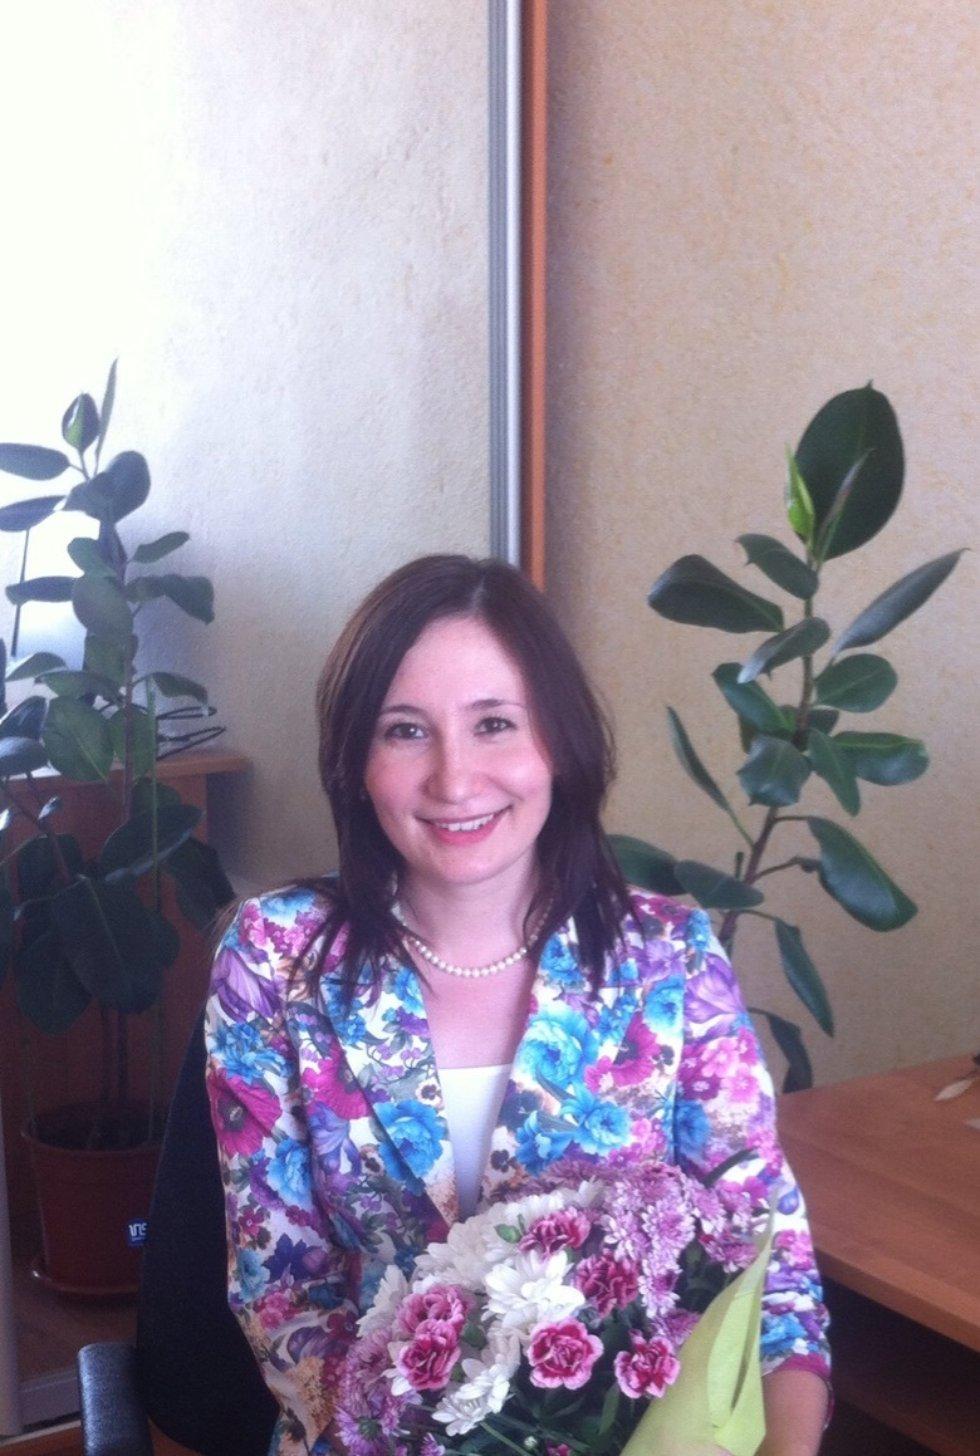 Фазлеева Эльмира Илдаровна